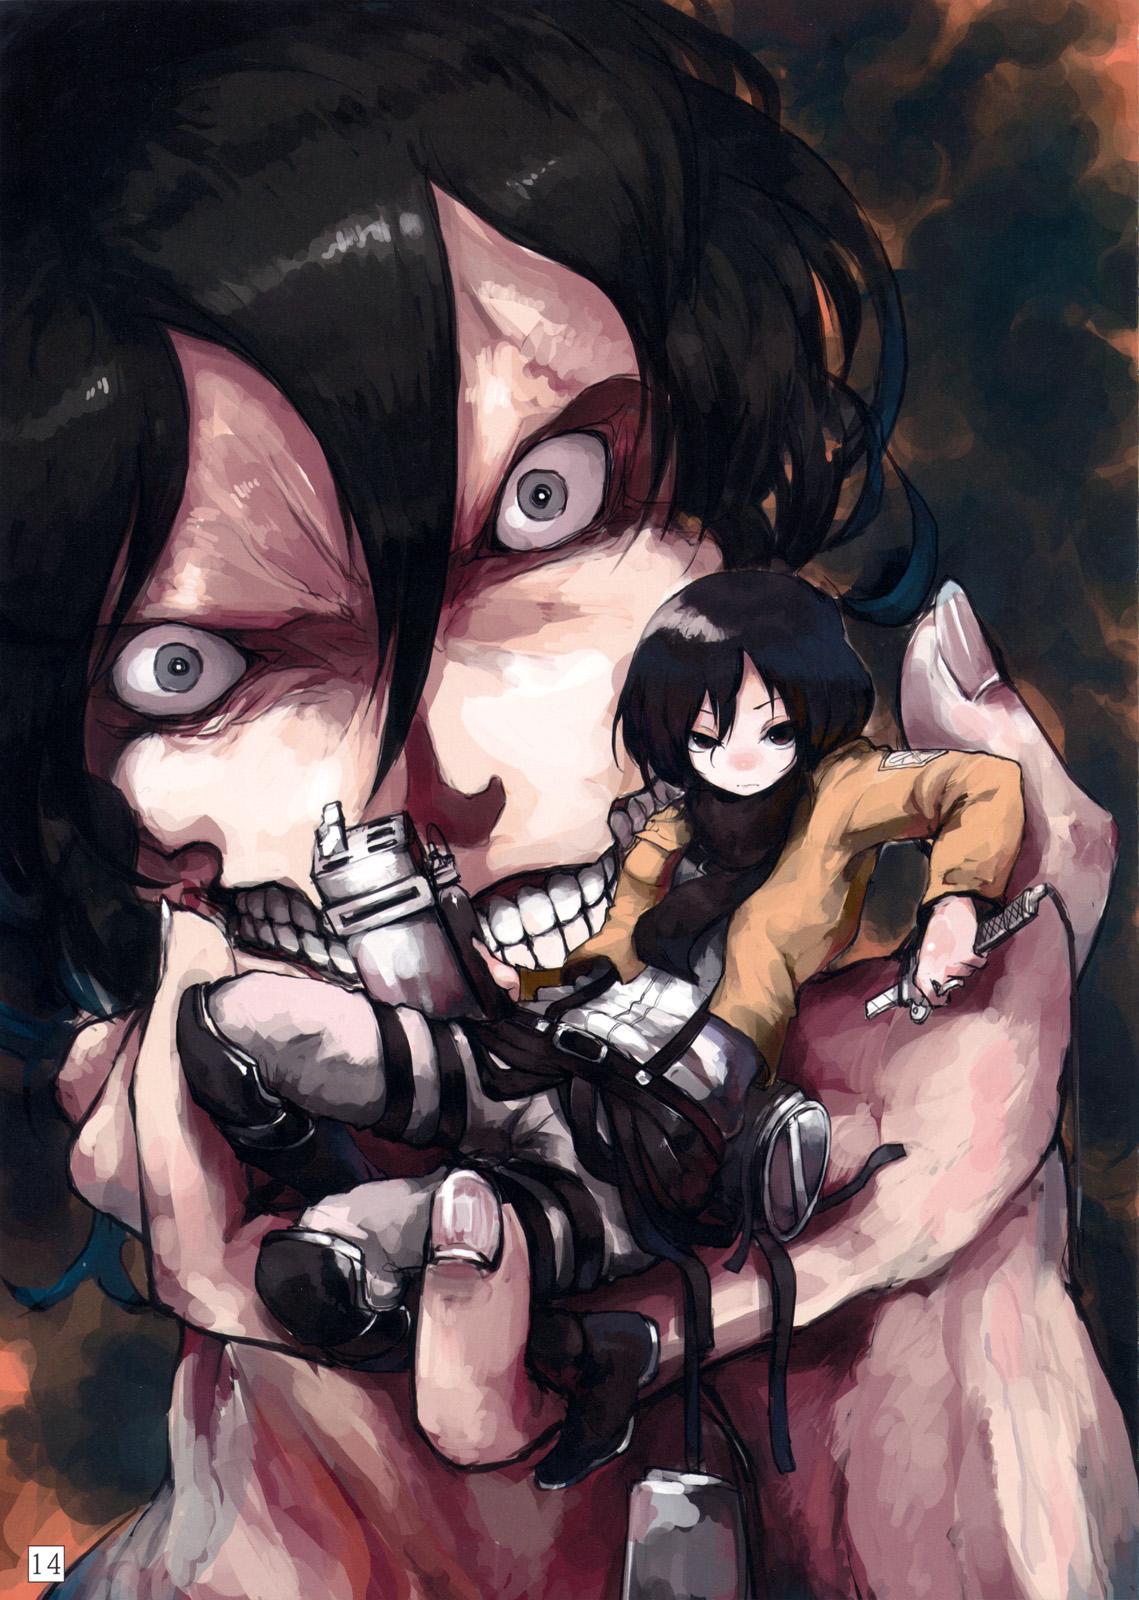 Attack on Titan Mobile Wallpaper #1526113 - Zerochan Anime Image Board